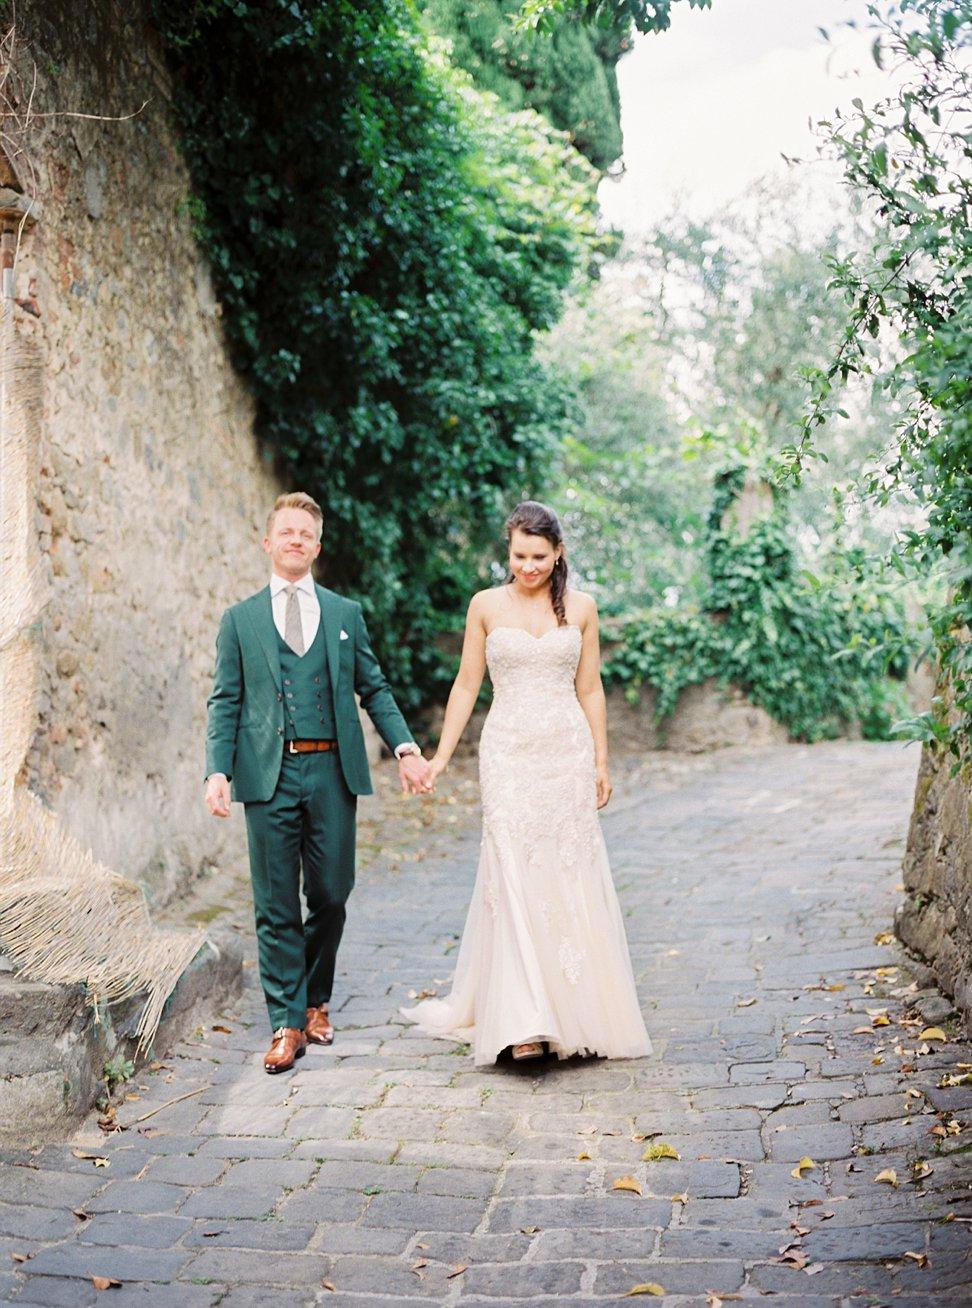 Amanda-Drost-photography-wedding-italy-Villa-sermolli-tuscany_0003.jpg